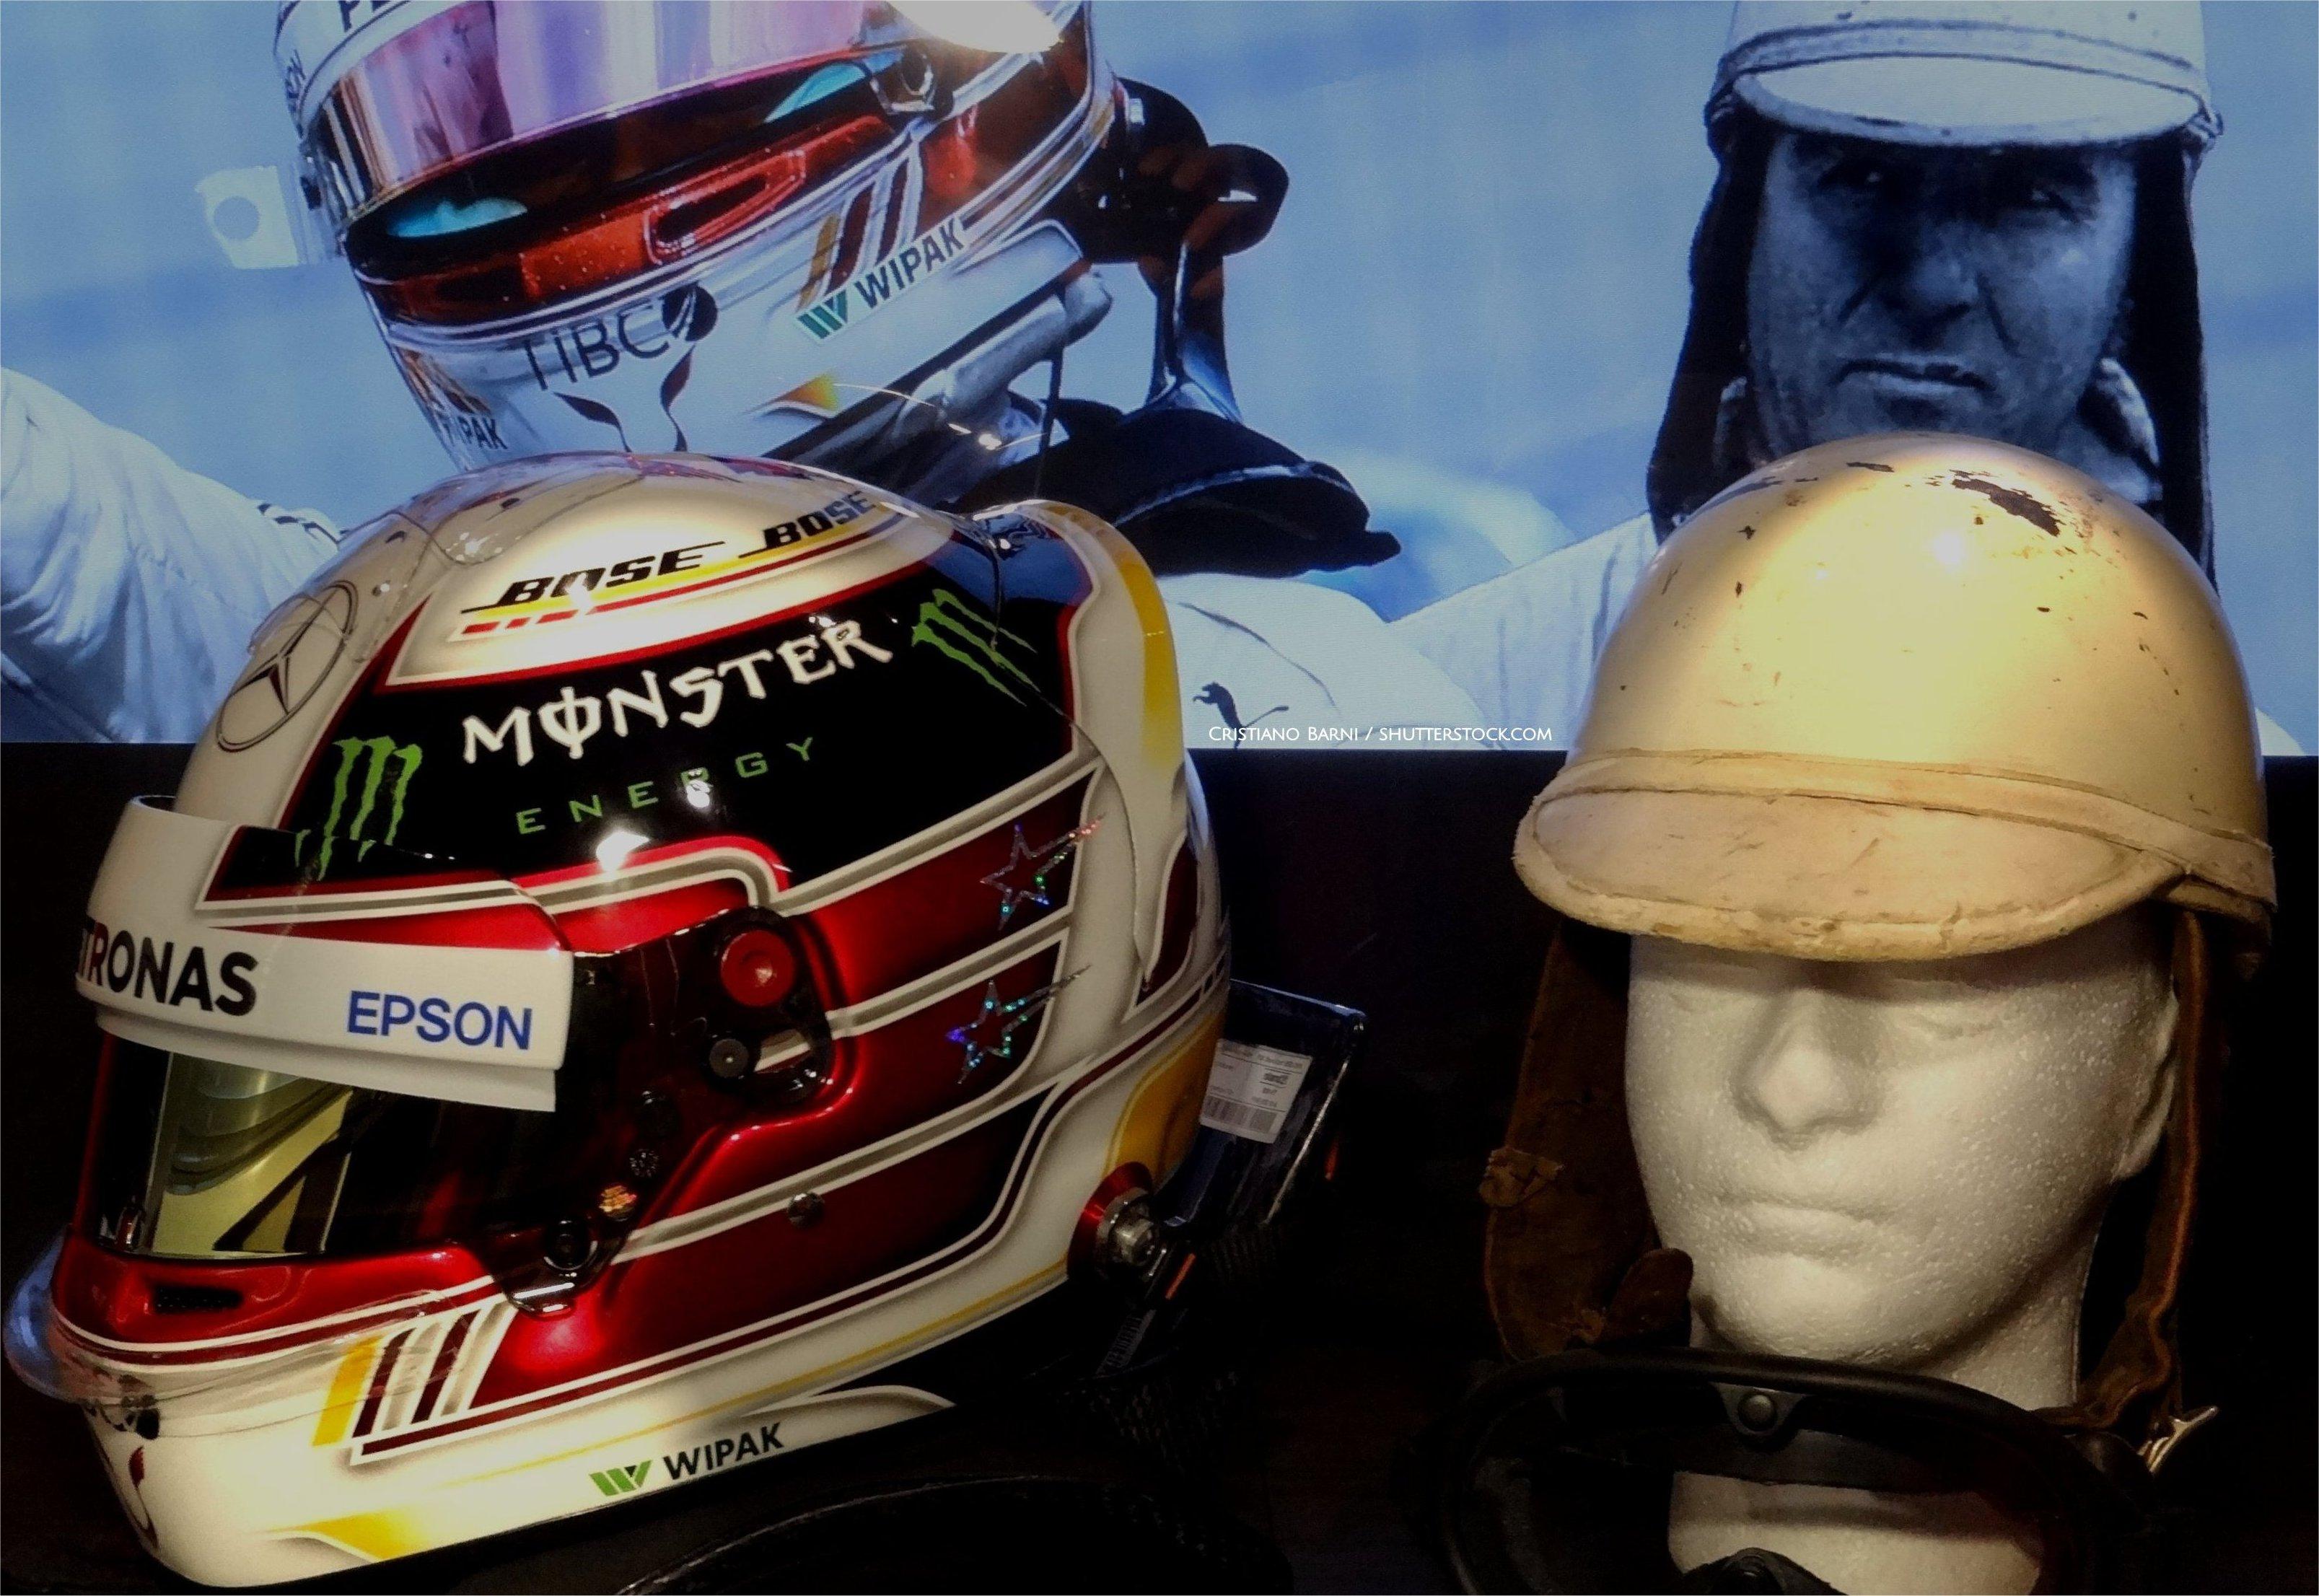 Lewis Hamilton Bell helmet 2018 and Giuseppe Farina Anderson helmet 1952